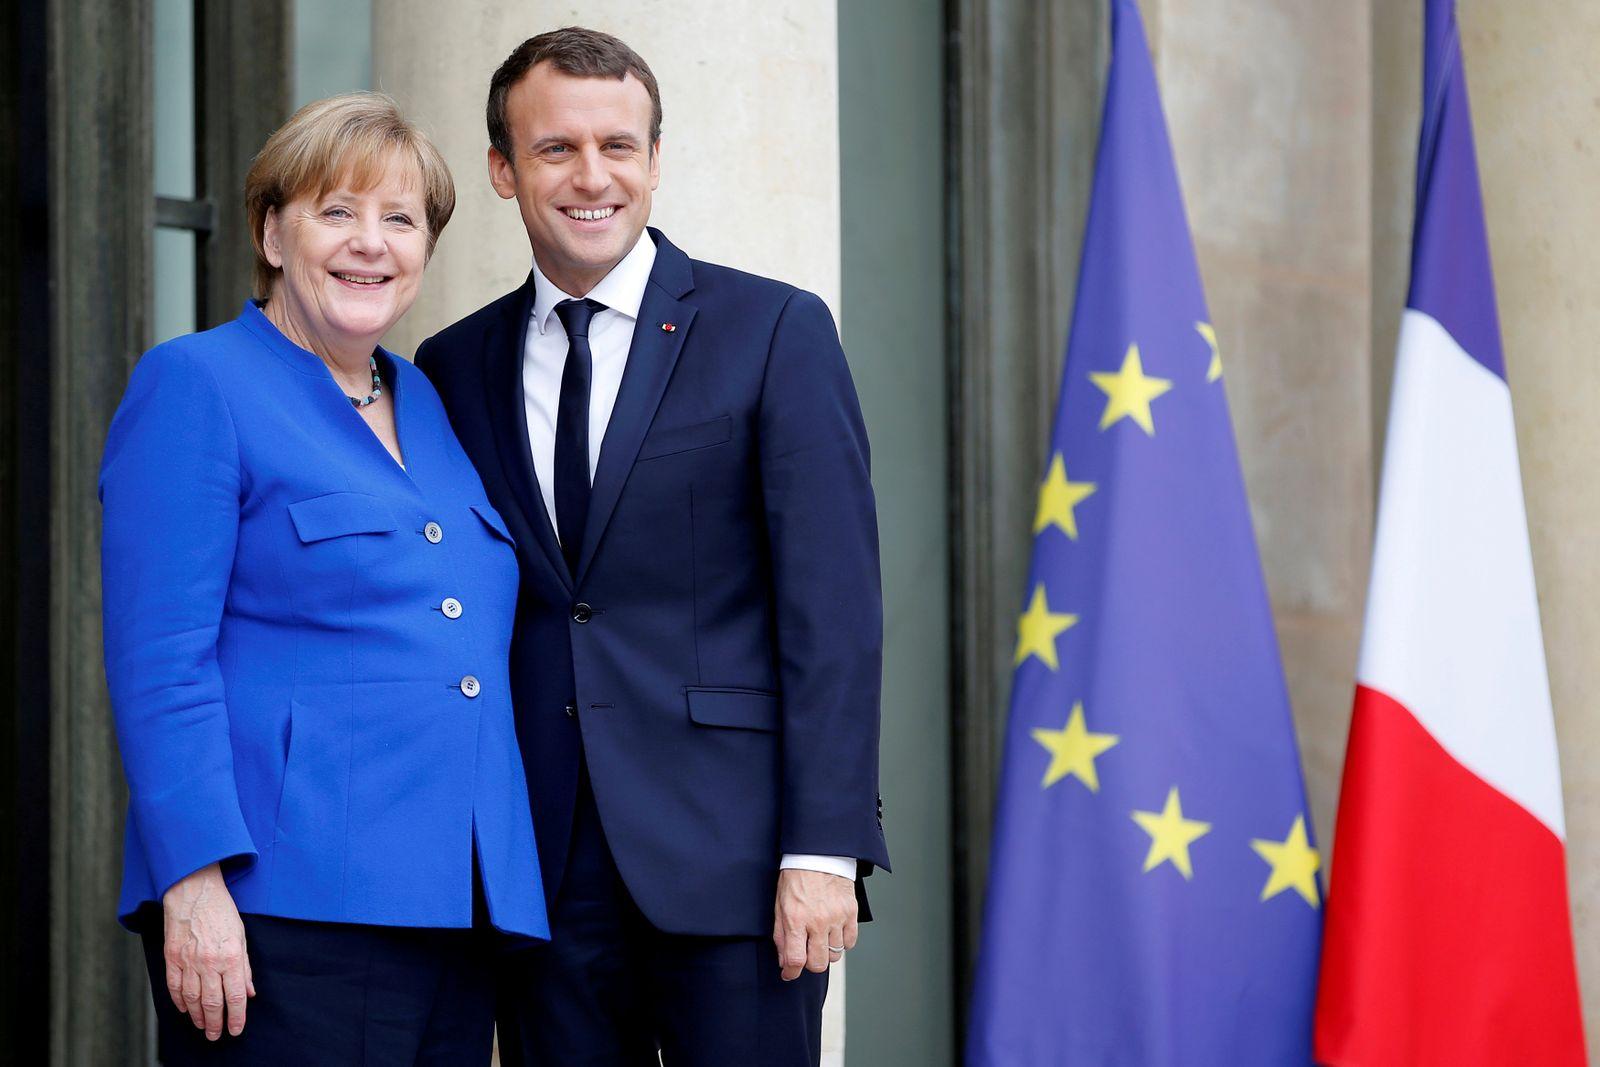 Macron / Merkel